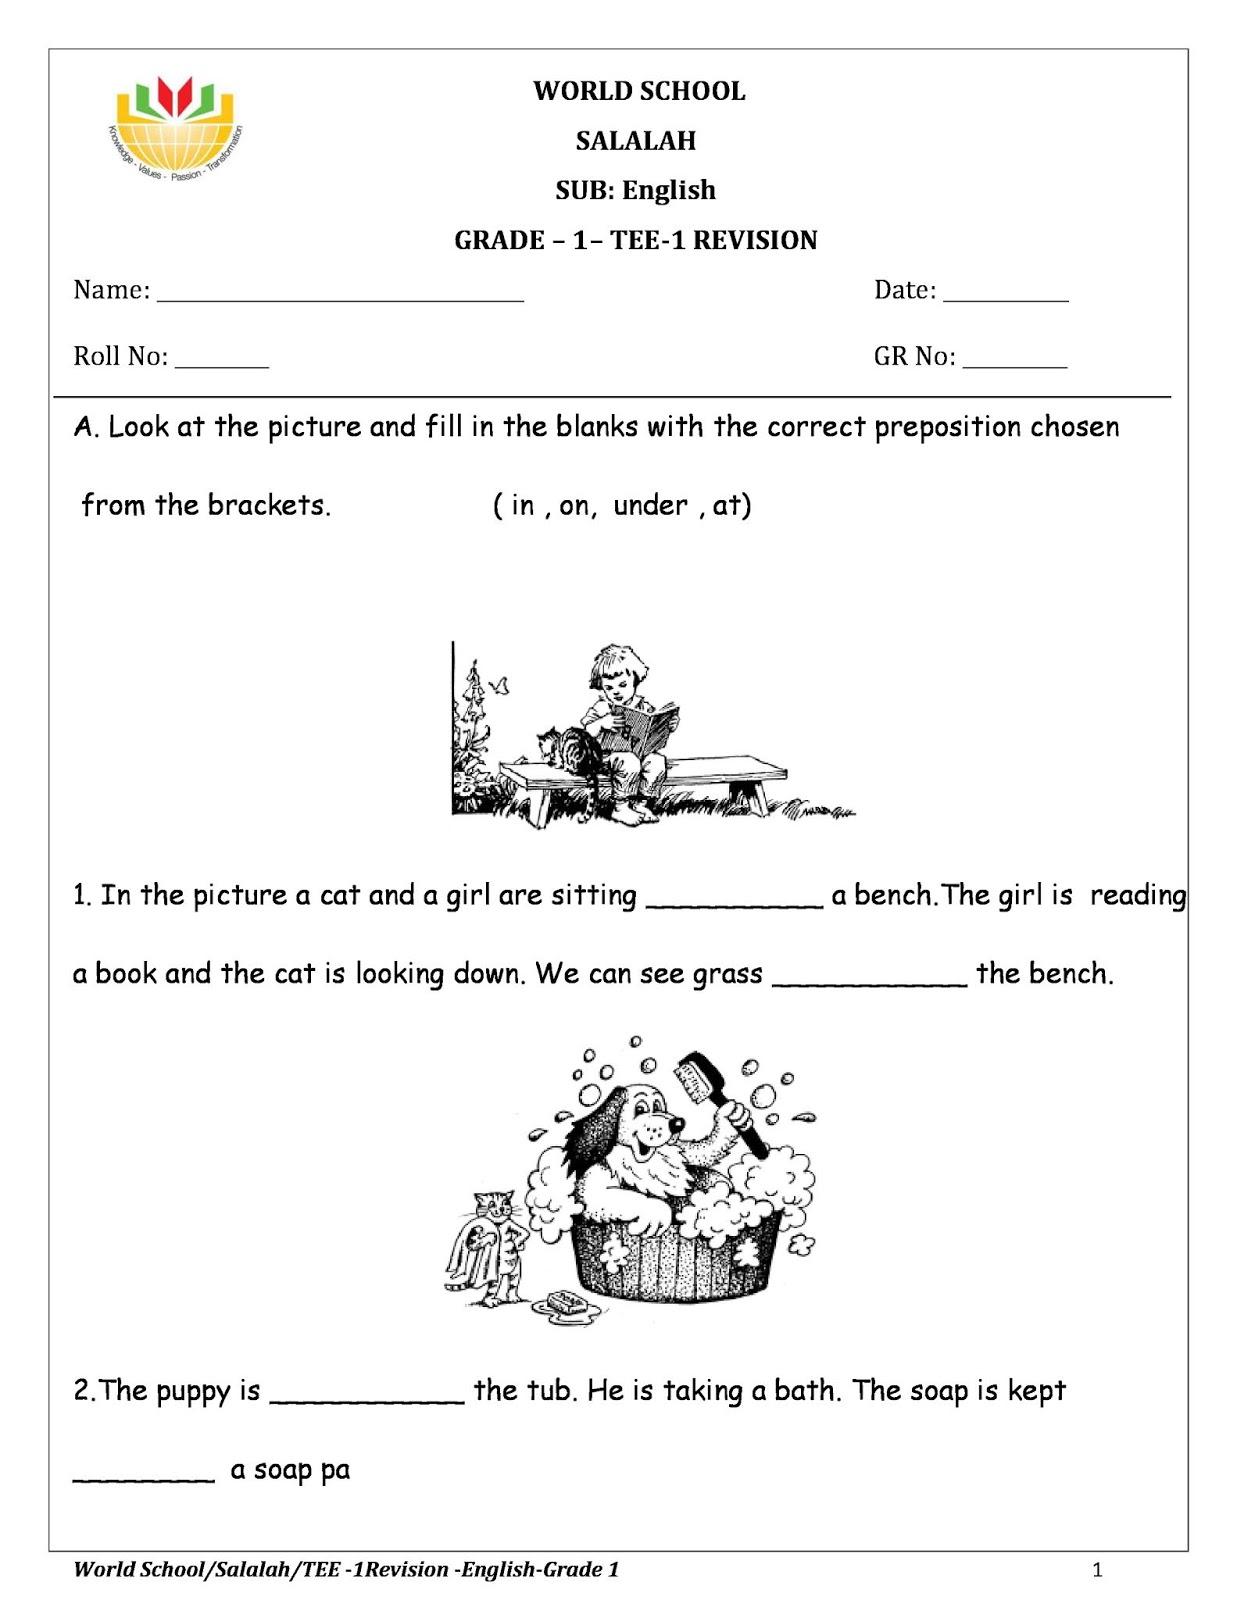 Birla World School Oman Homework For Grade 1 As On 23 12